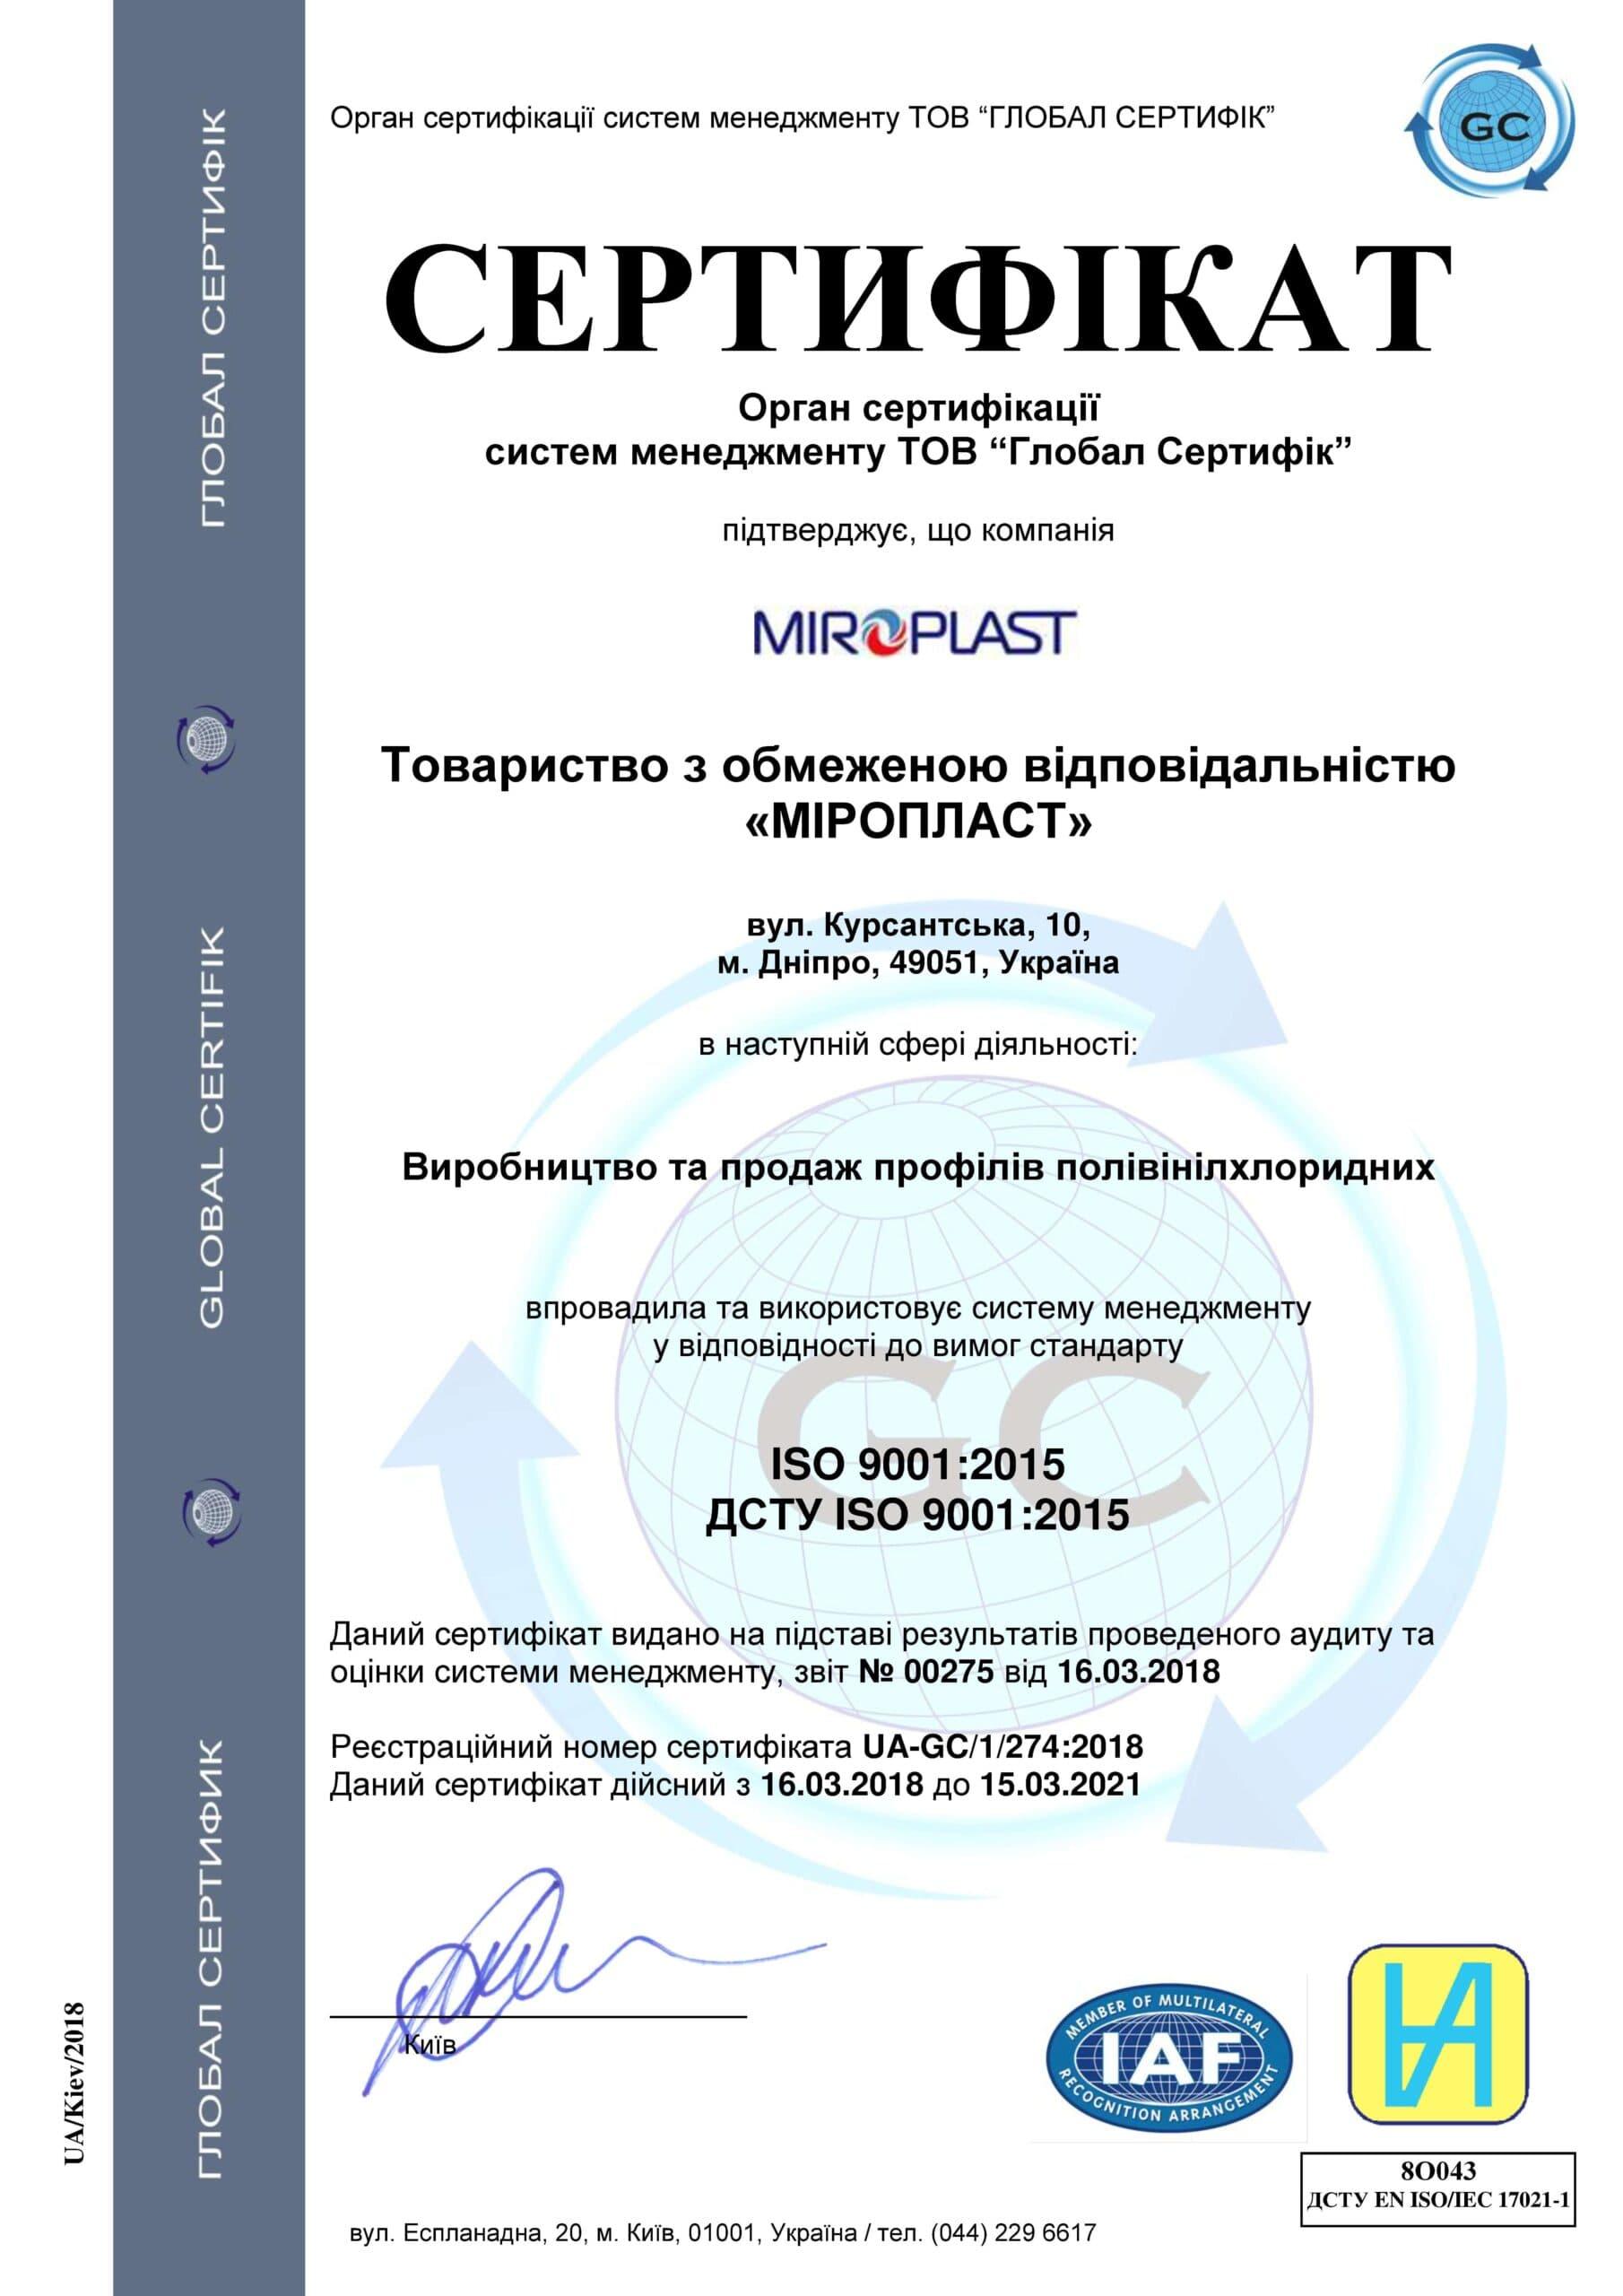 3SERTIFIKAT ISO PROFILI MIROPLAST